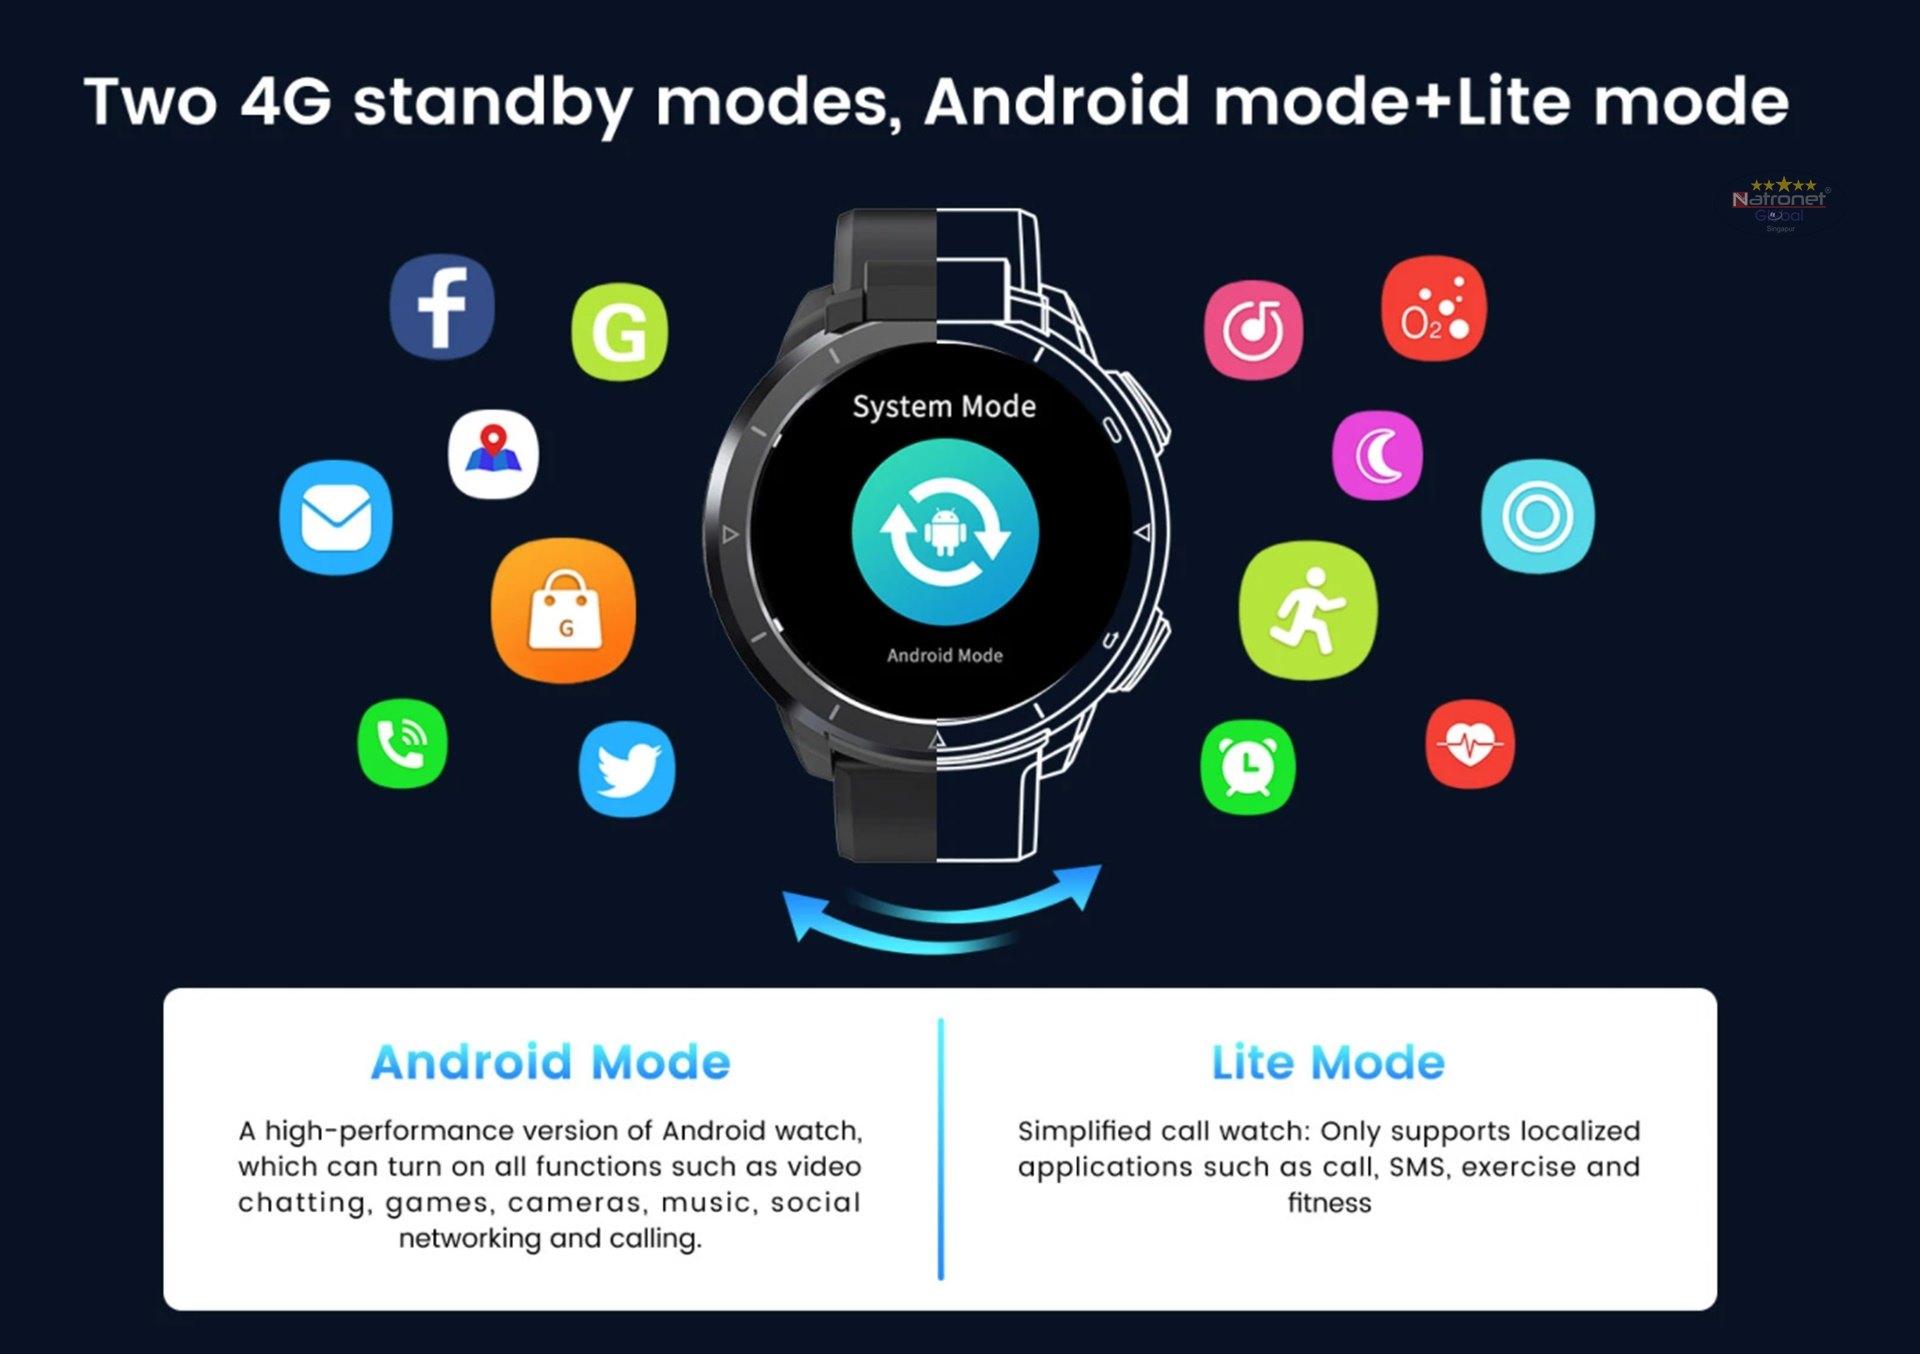 KOSPET Optimus 2 Akıllı Saat Dual Mod Dual Chip 4G+64G Sekiz Çekirdekli 4G-LTE 2260 mAh Pil